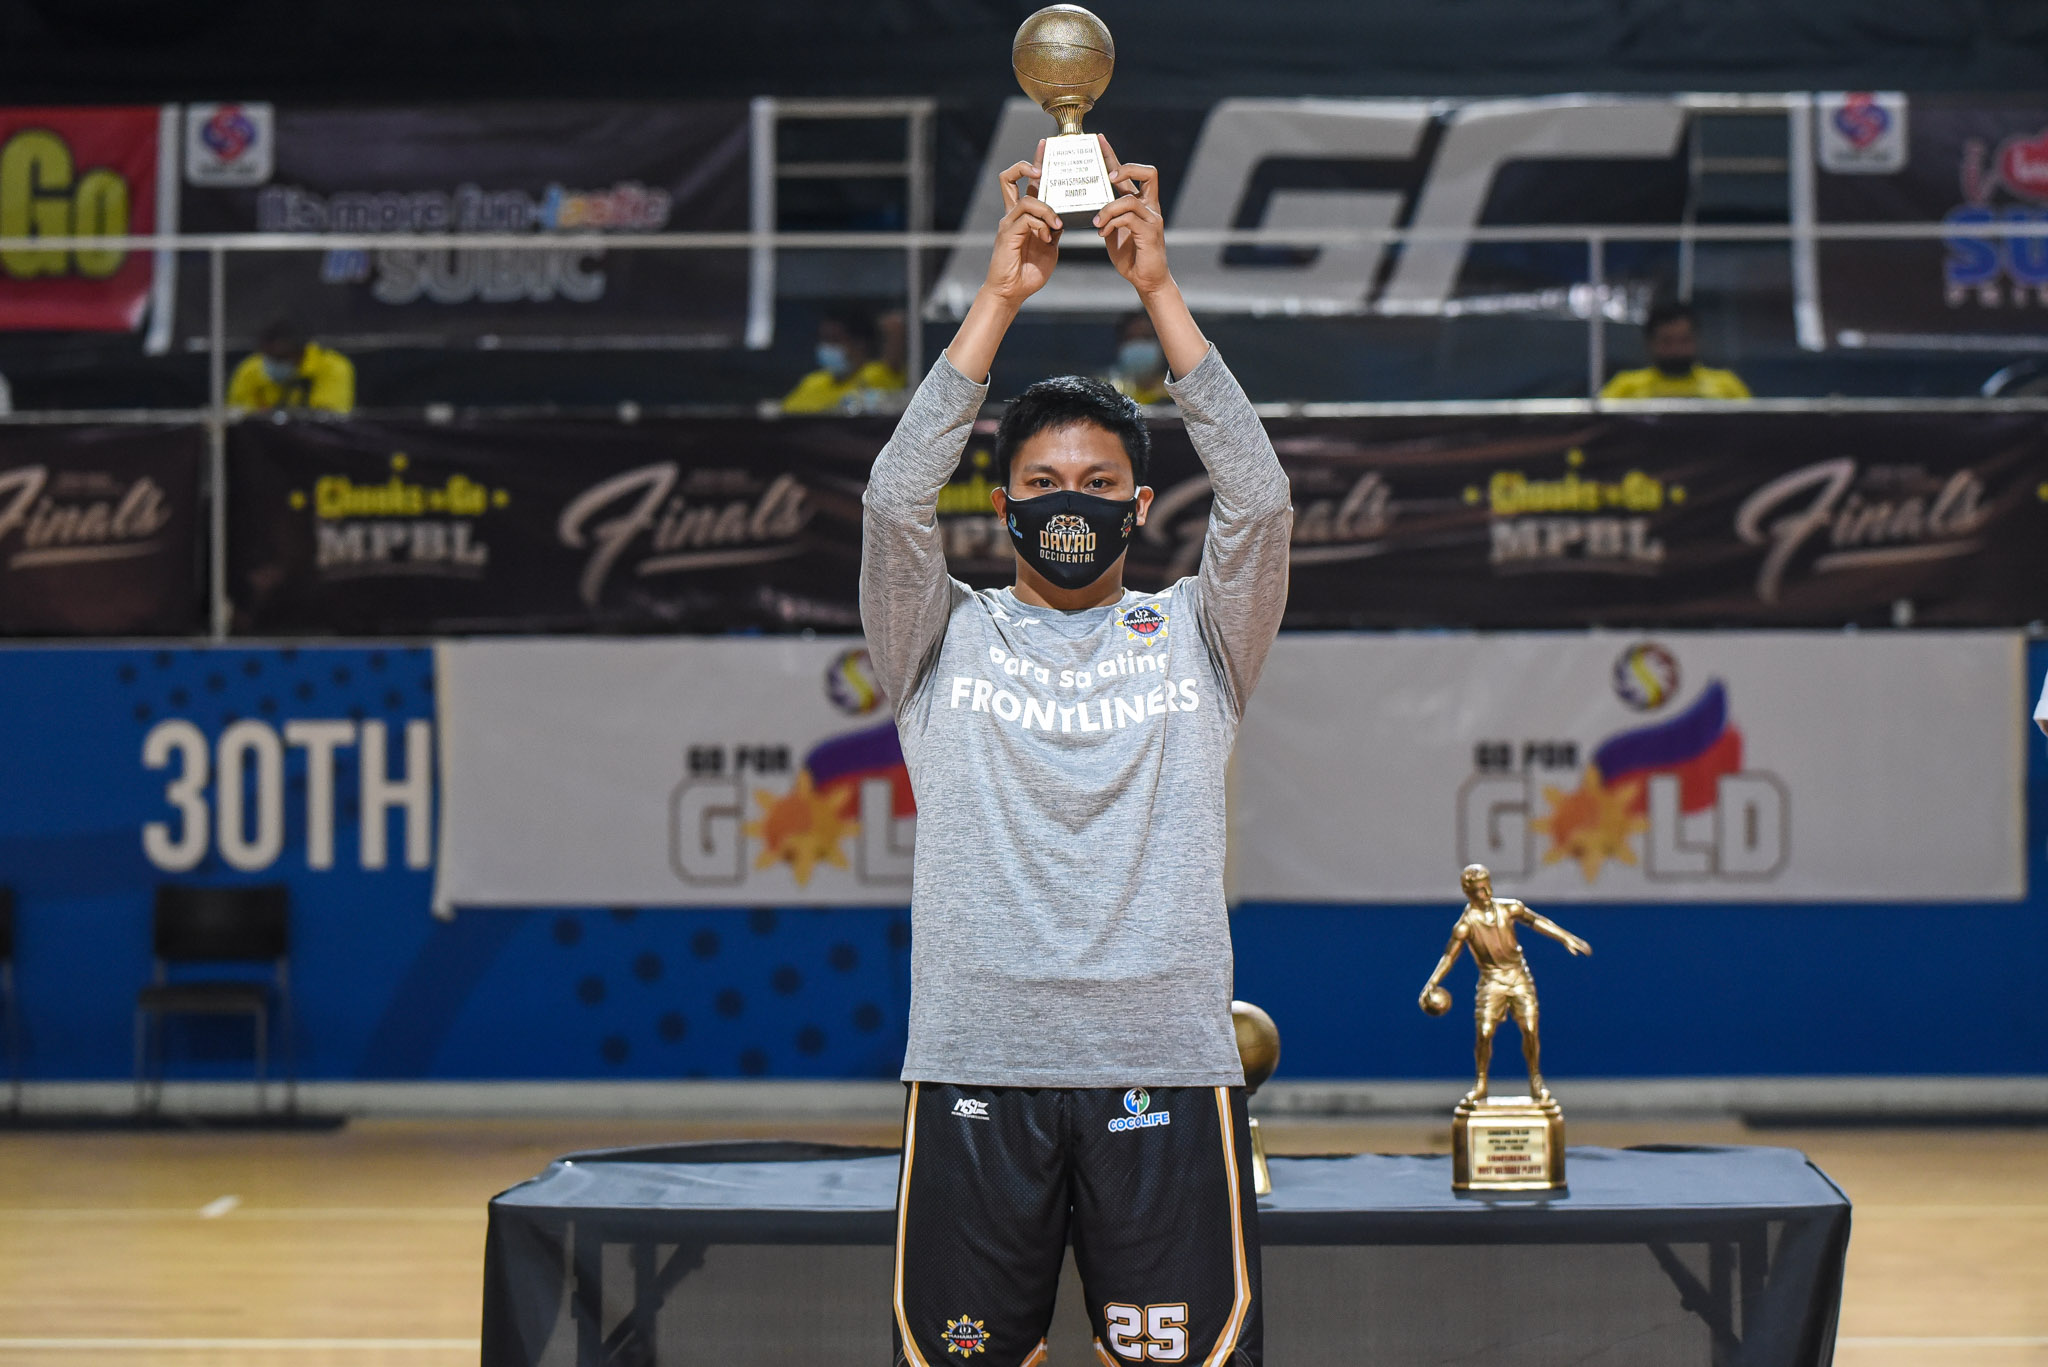 2019-21-Chooks-to-Go-MPBL-Lakan-Season-Awarding-Ceremony-Sportsmanship-Award-Billy-Robles John Wilson crowned Chooks-to-Go MPBL Lakan Season MVP Basketball MPBL News  - philippine sports news